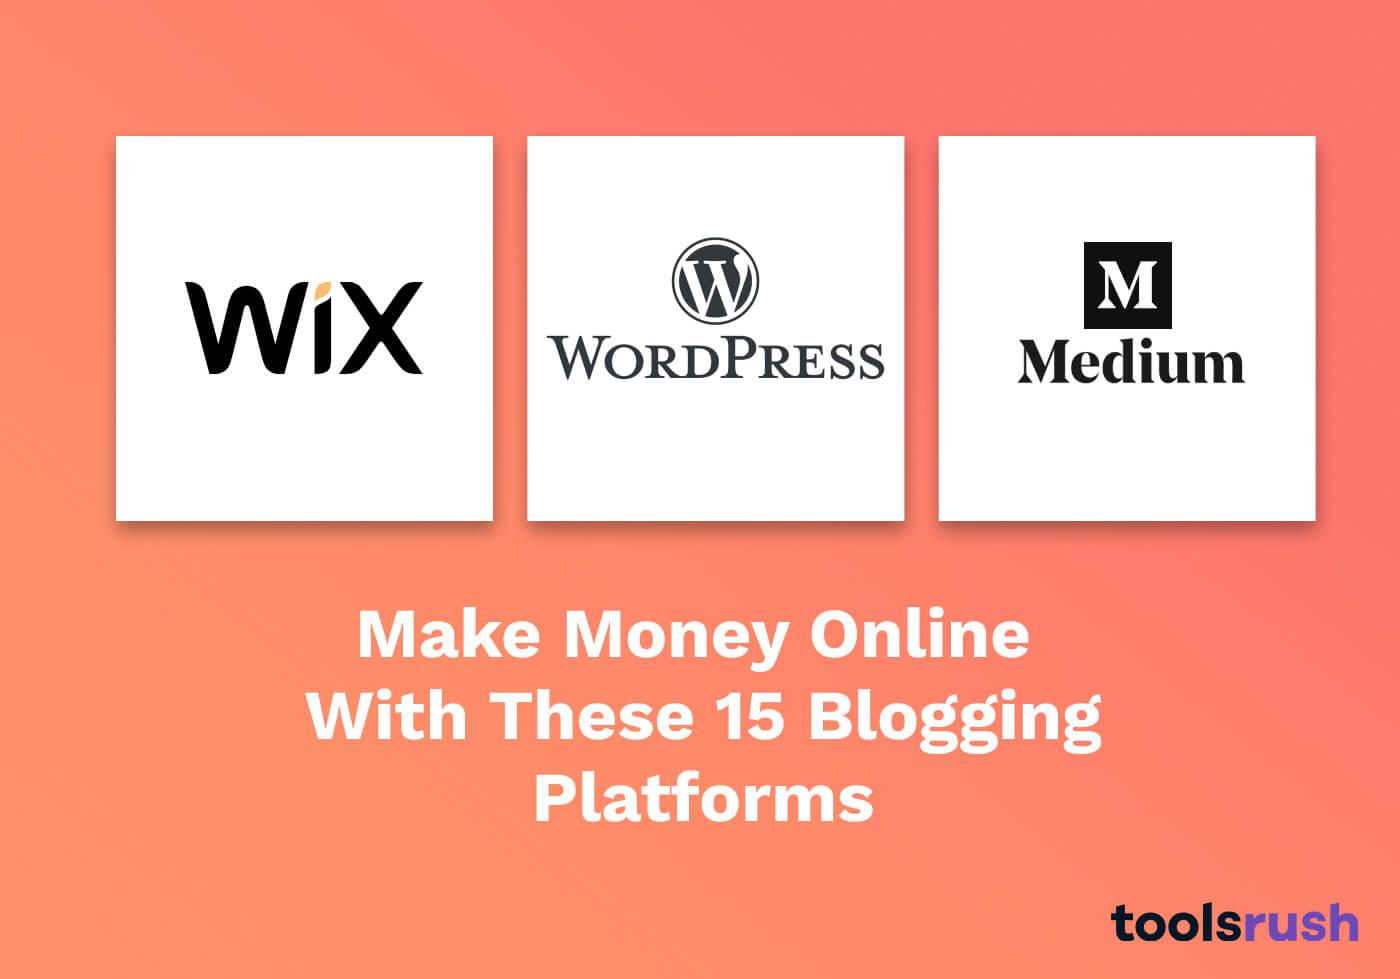 15 Best Free and Paid Blogging Platforms To Make Money Online 1